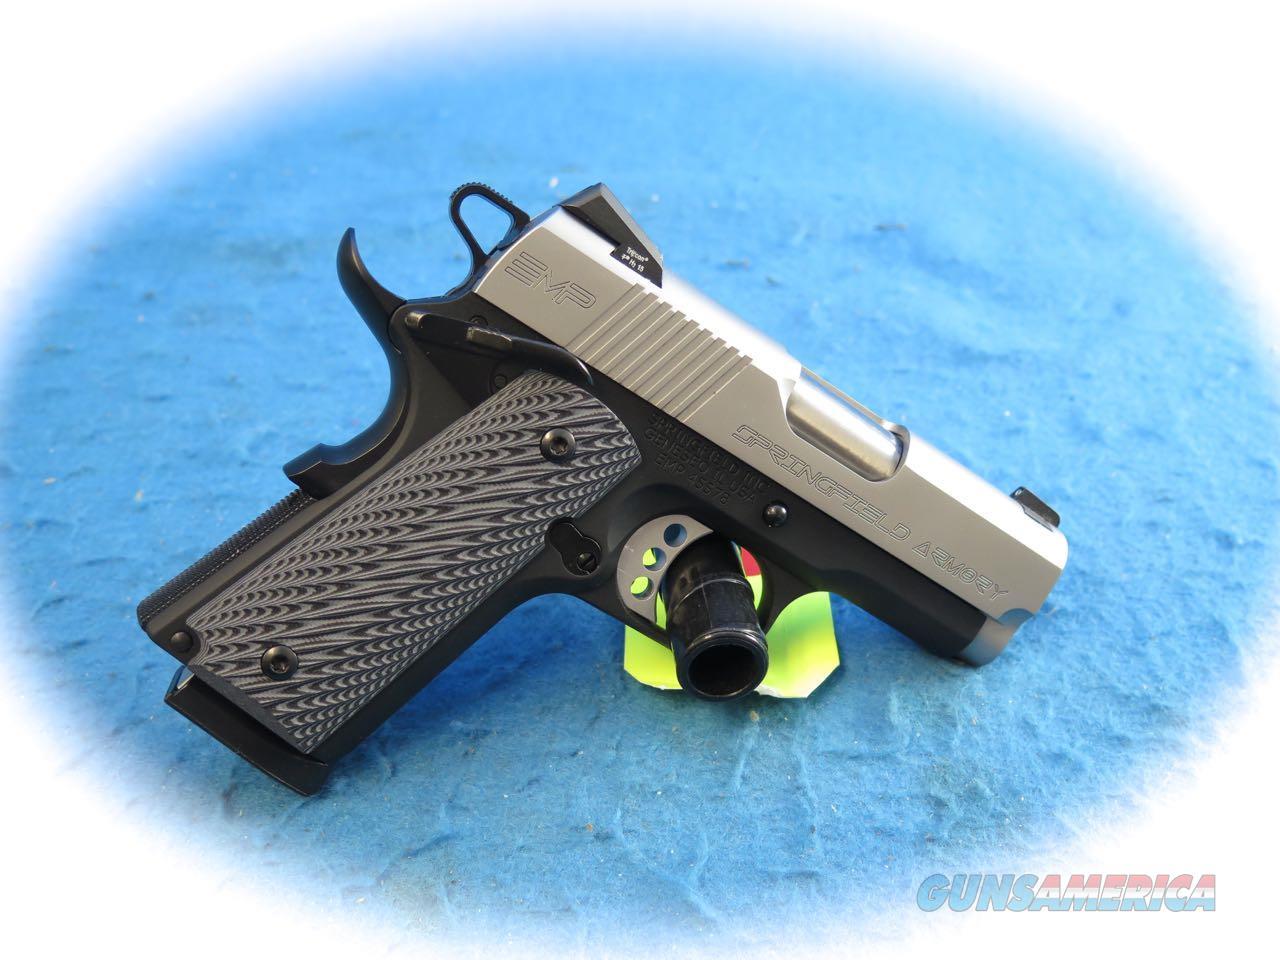 Springfield Armory 1911 EMP 9mm Semi Auto Pistol 2-Tone **New**  Guns > Pistols > Springfield Armory Pistols > 1911 Type